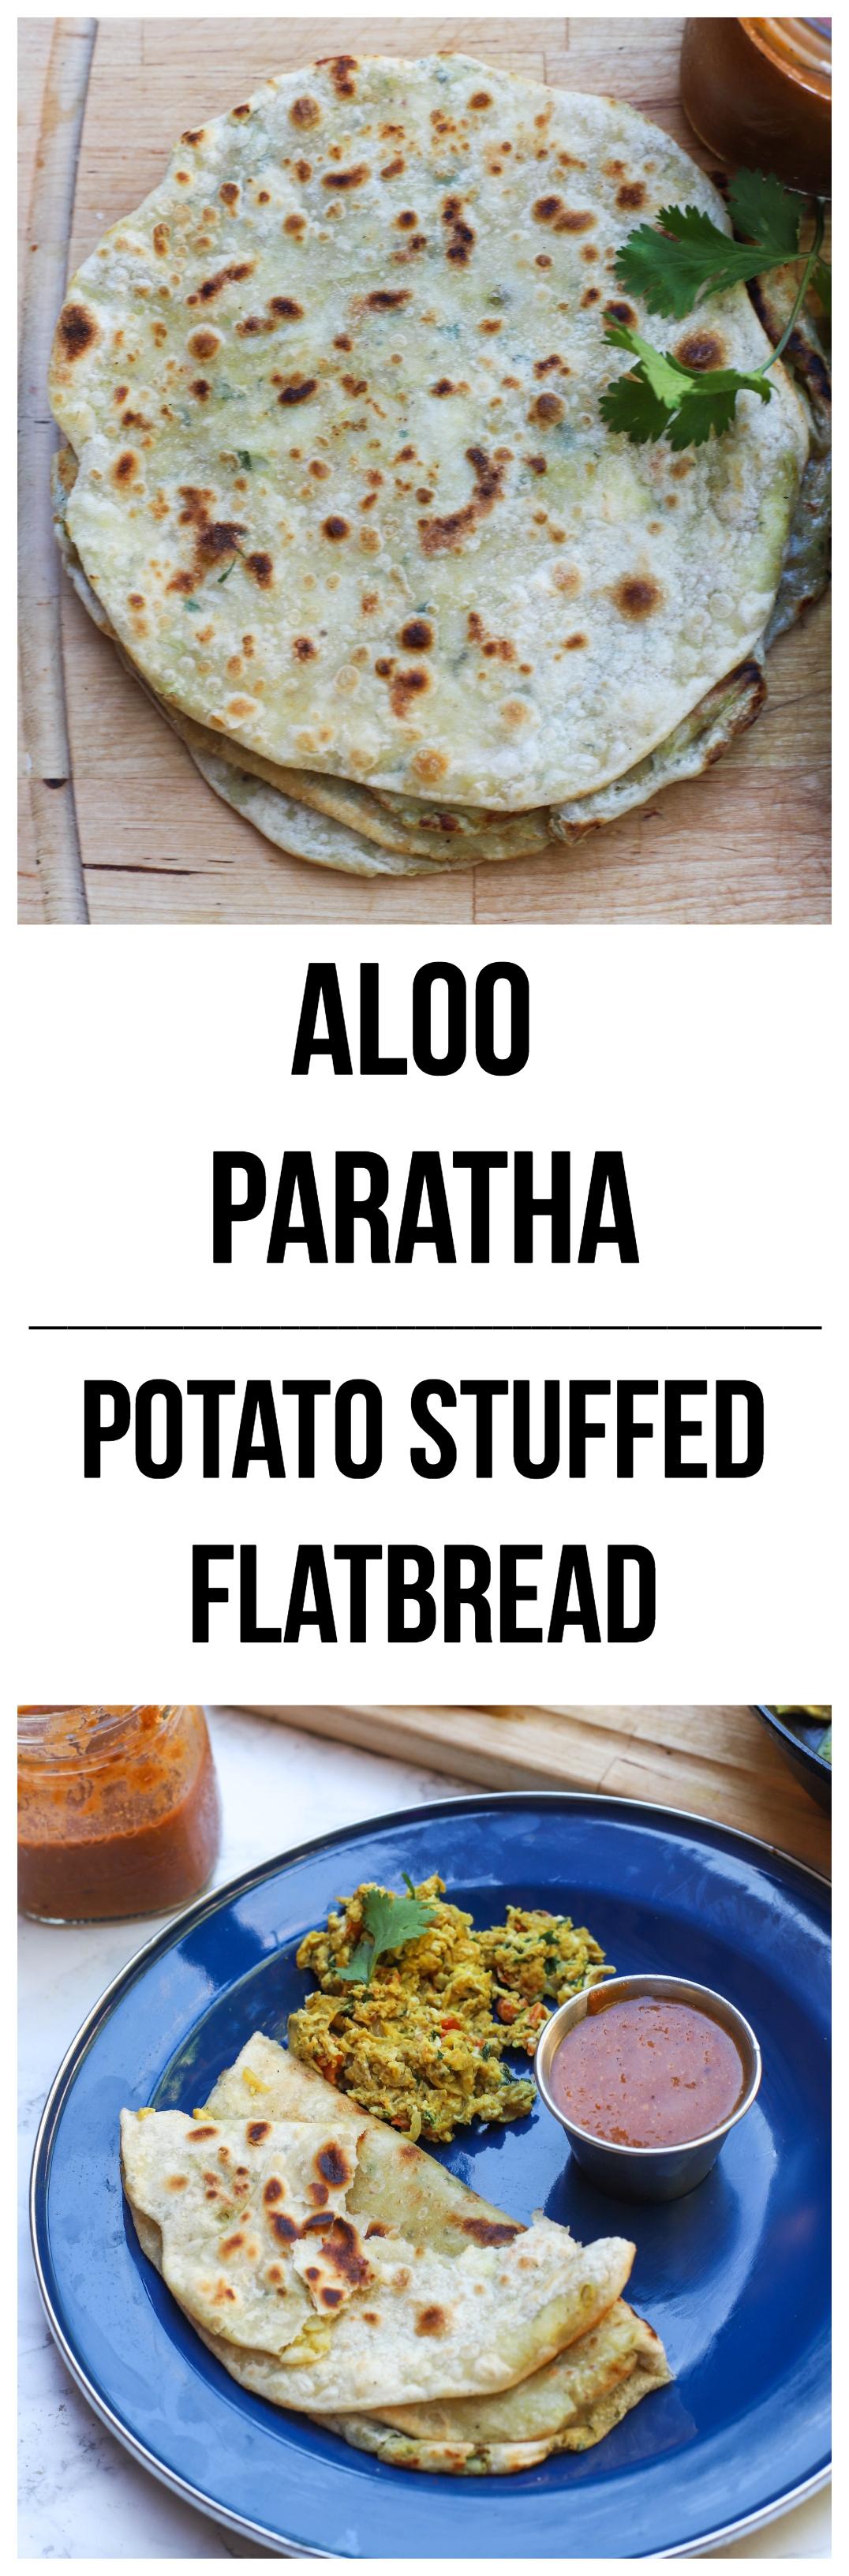 aloo paratha (potato stuffed Indian flatbread)